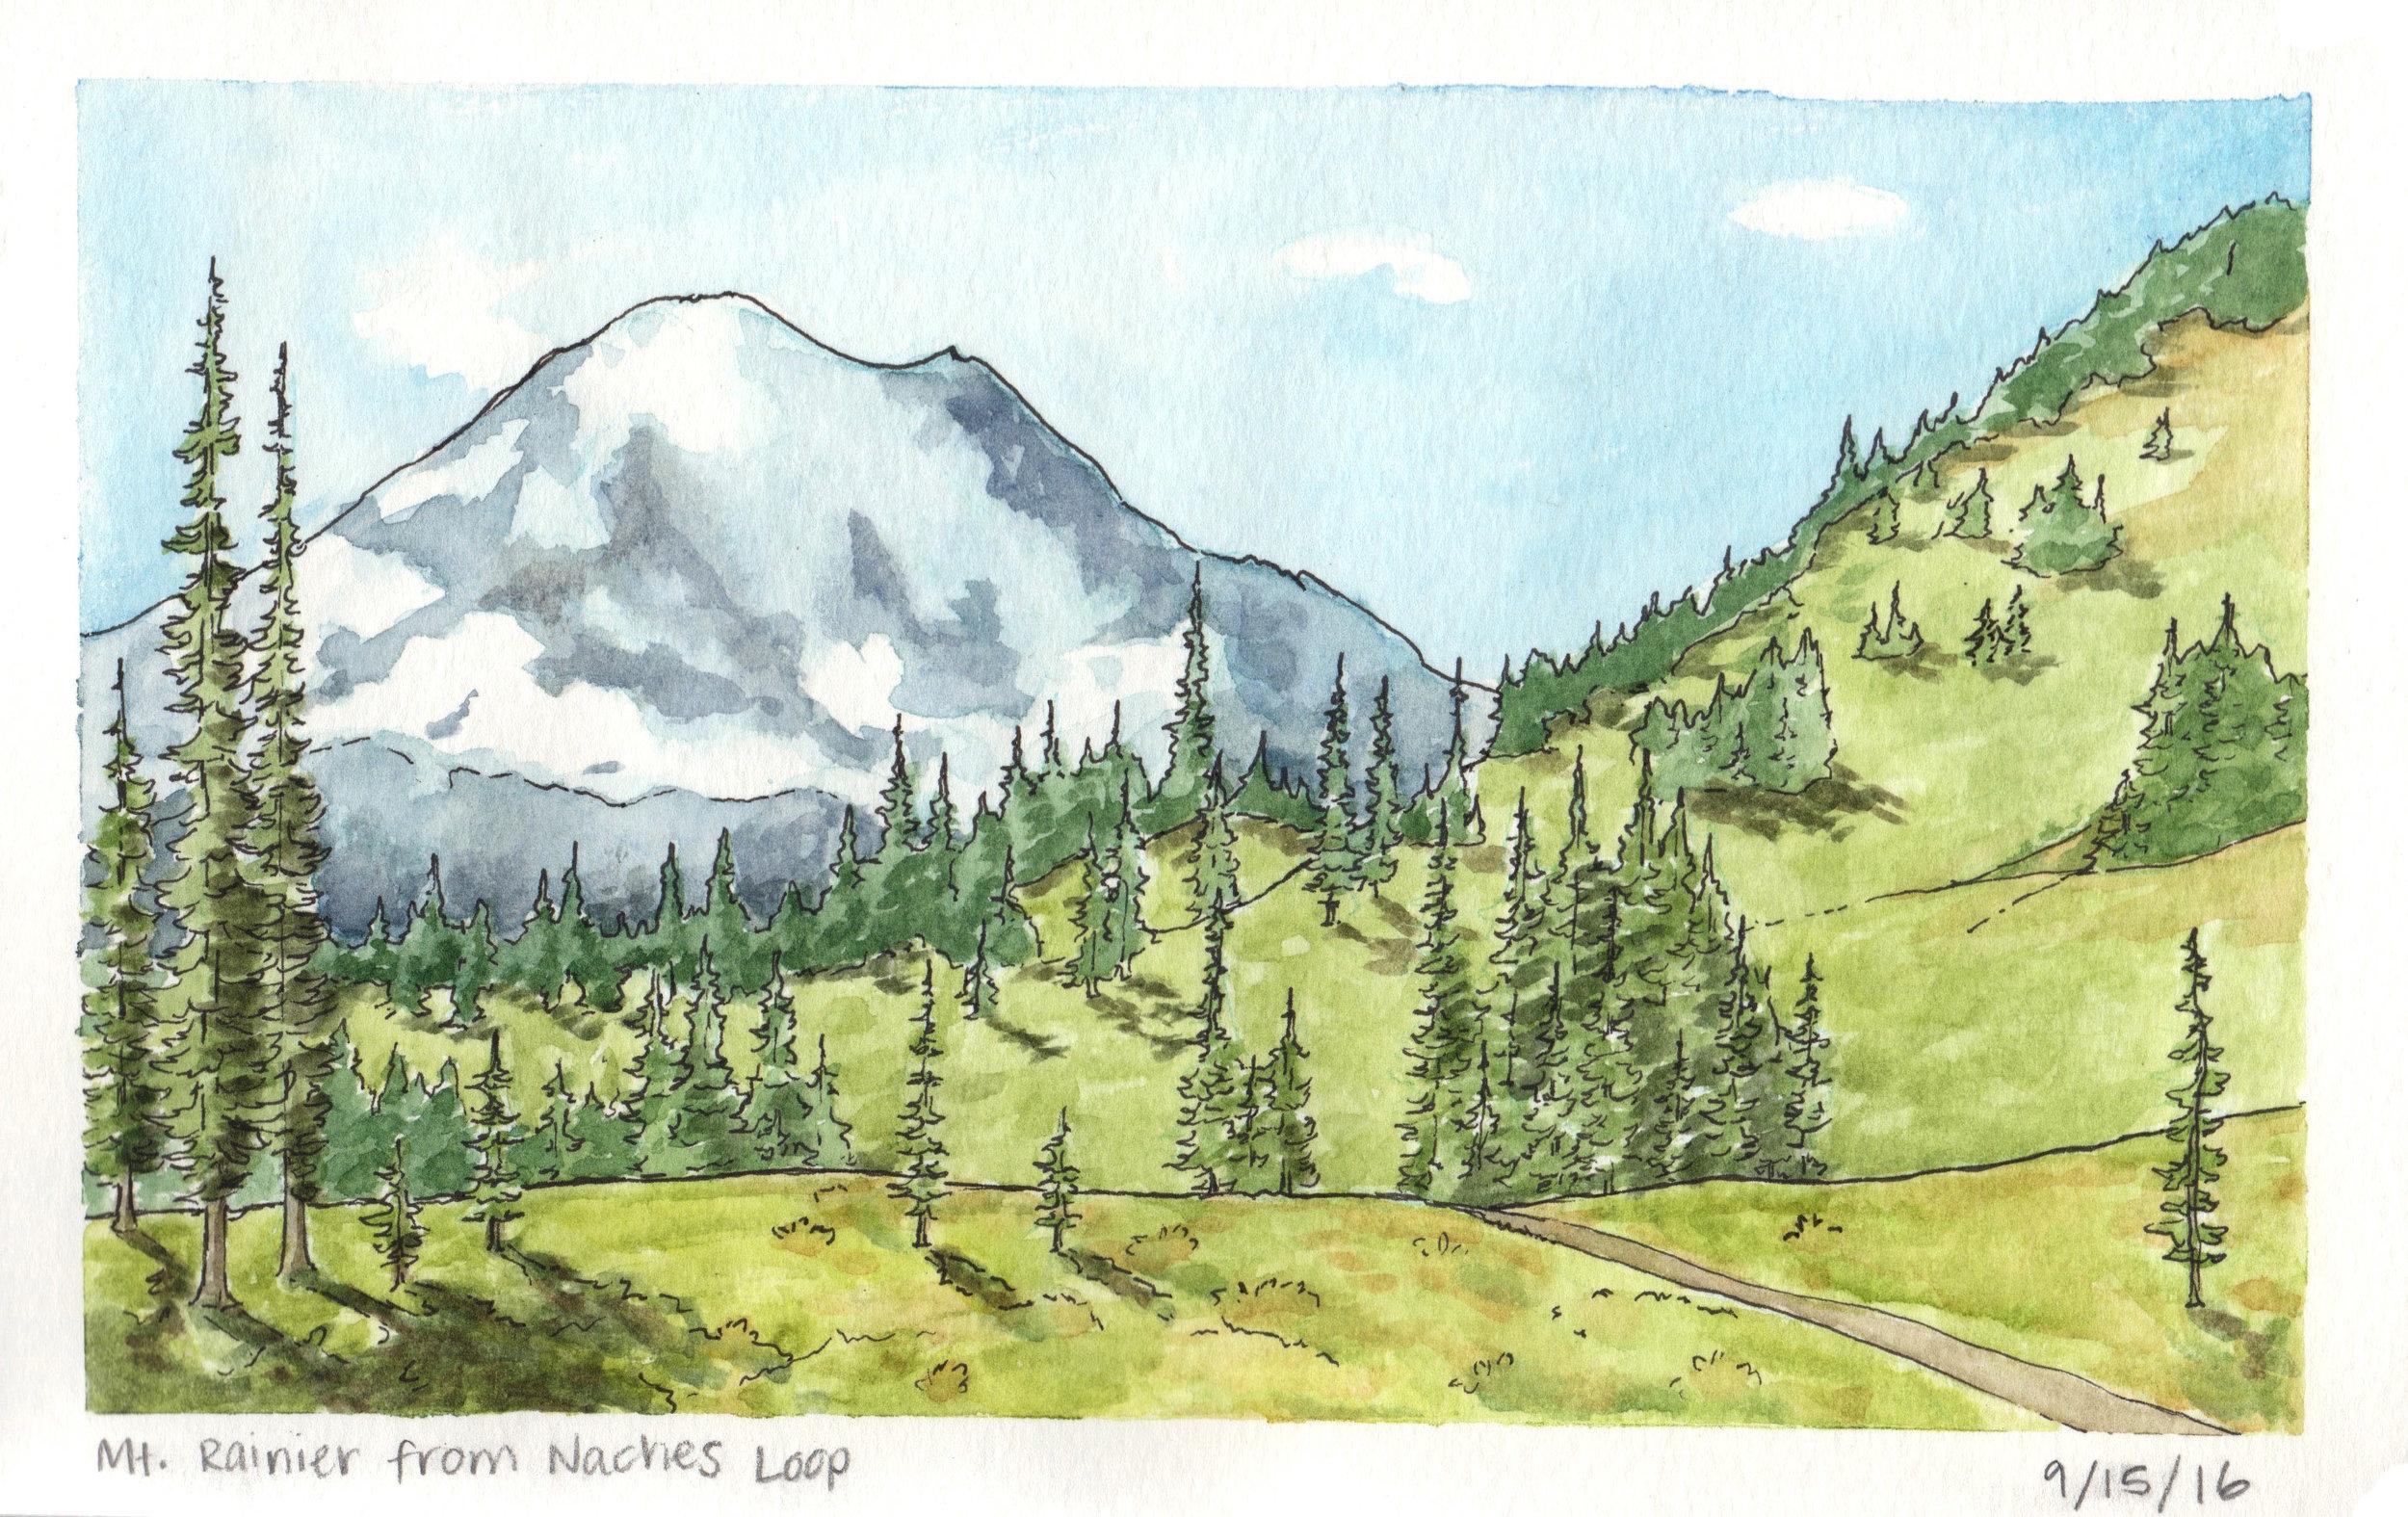 Mount Rainier from Naches Peak